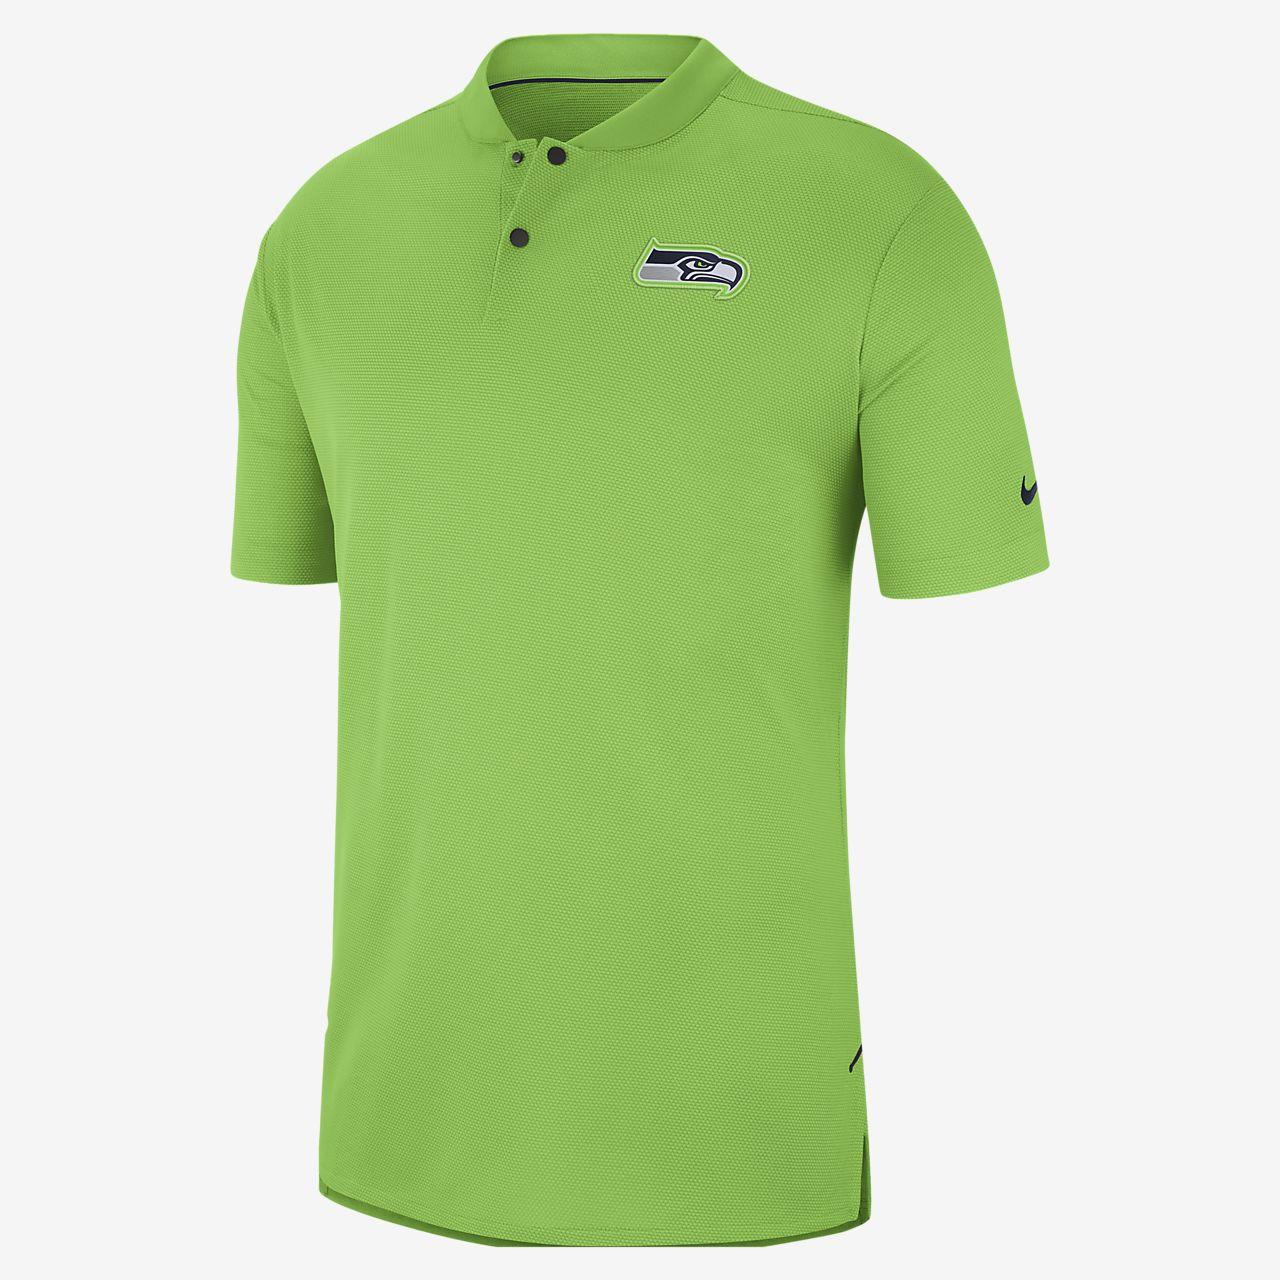 huge discount b5438 27642 Nike Dri-FIT Elite (NFL Seahawks) Men's Polo